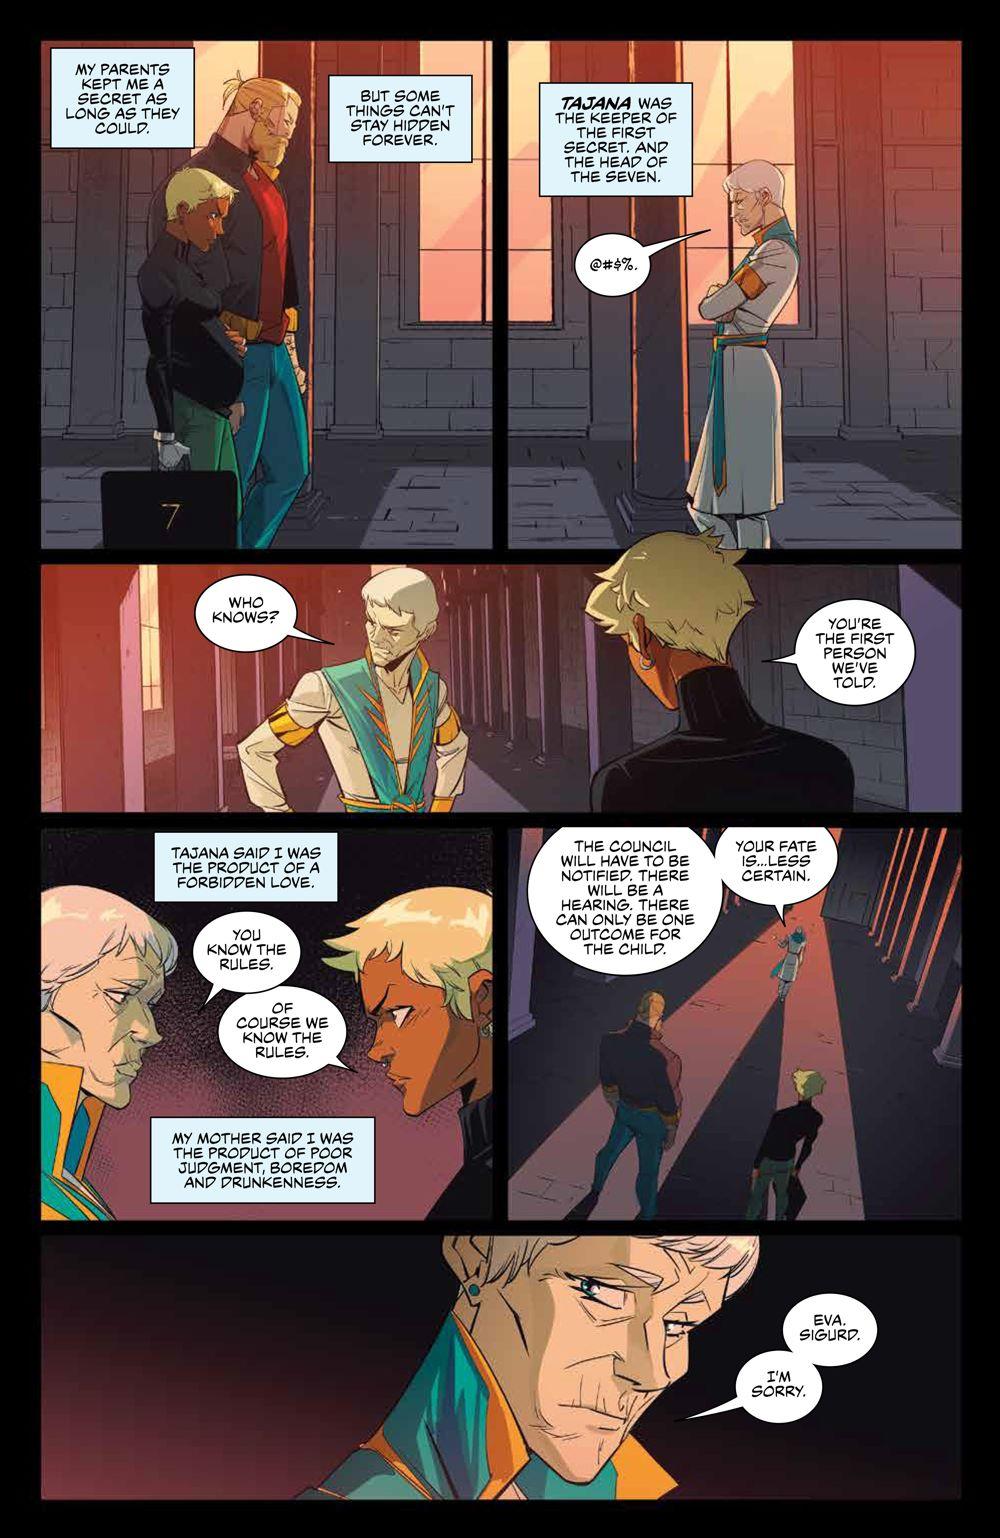 SevenSecrets_v1_SC_PRESS_17 ComicList Previews: SEVEN SECRETS VOLUME 1 TP